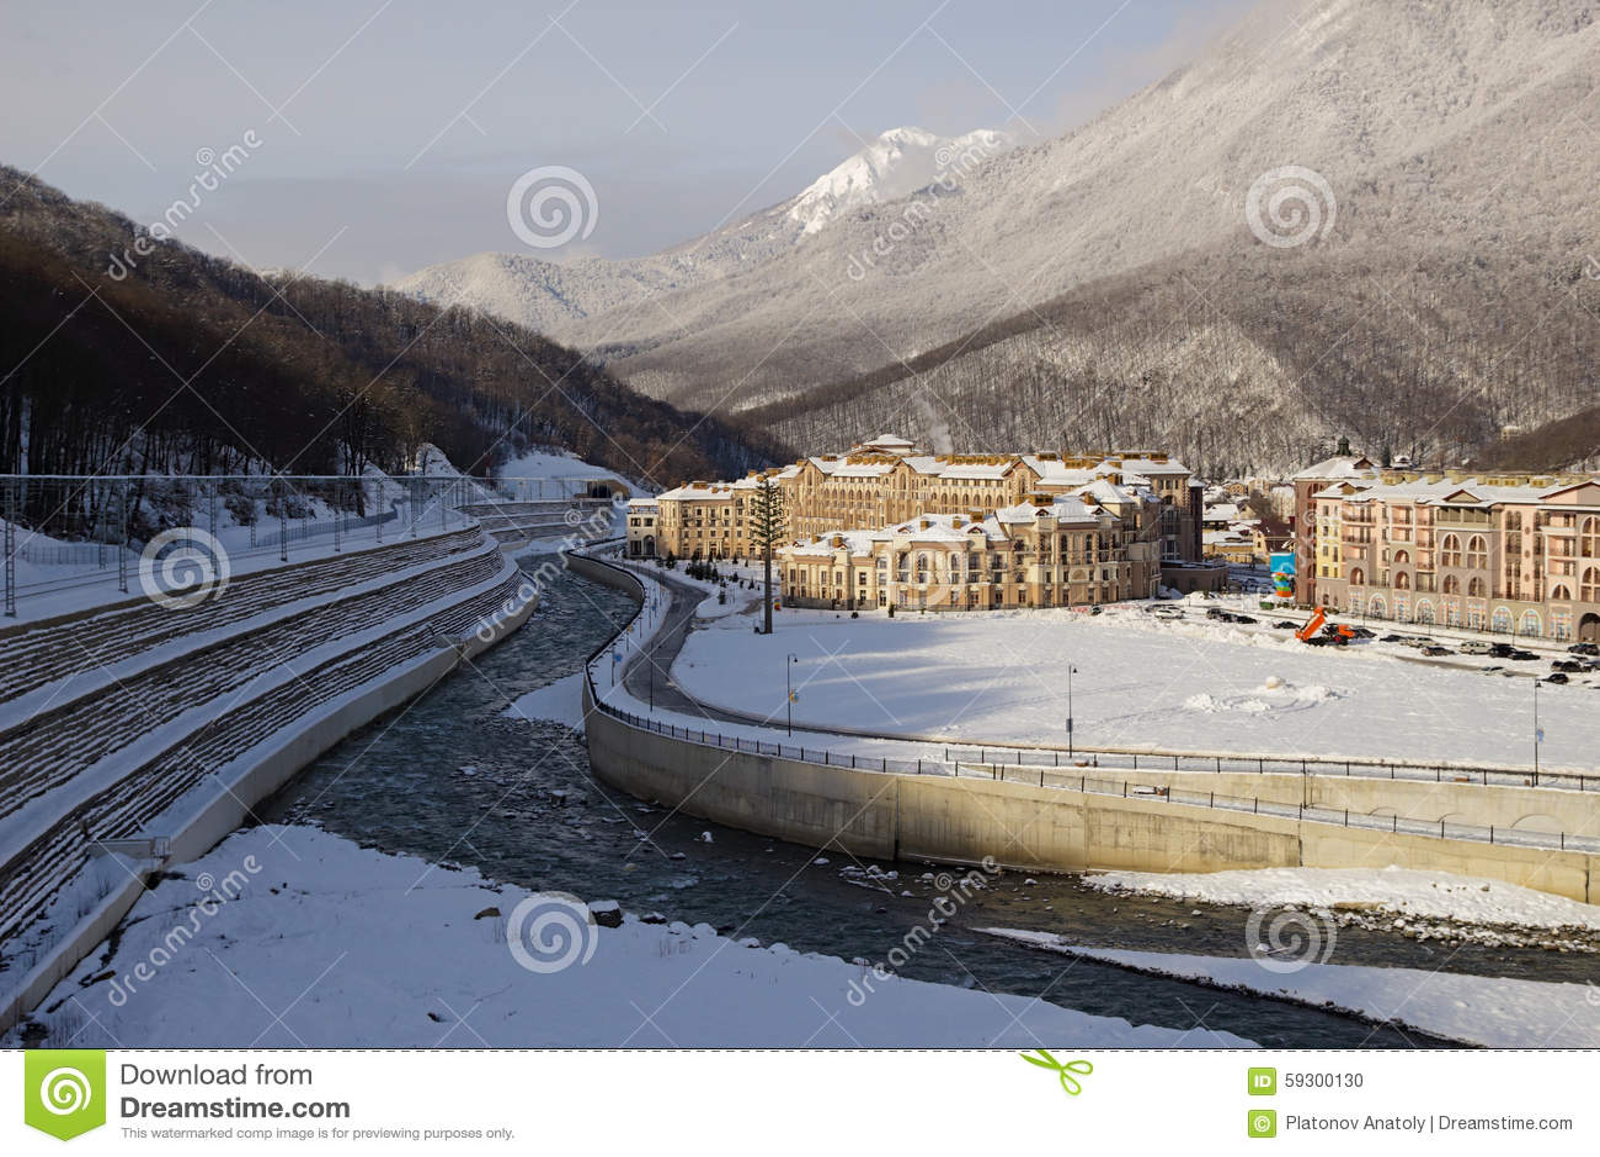 esto-sadok (sochi, russia) is one of the best winter ski resorts in